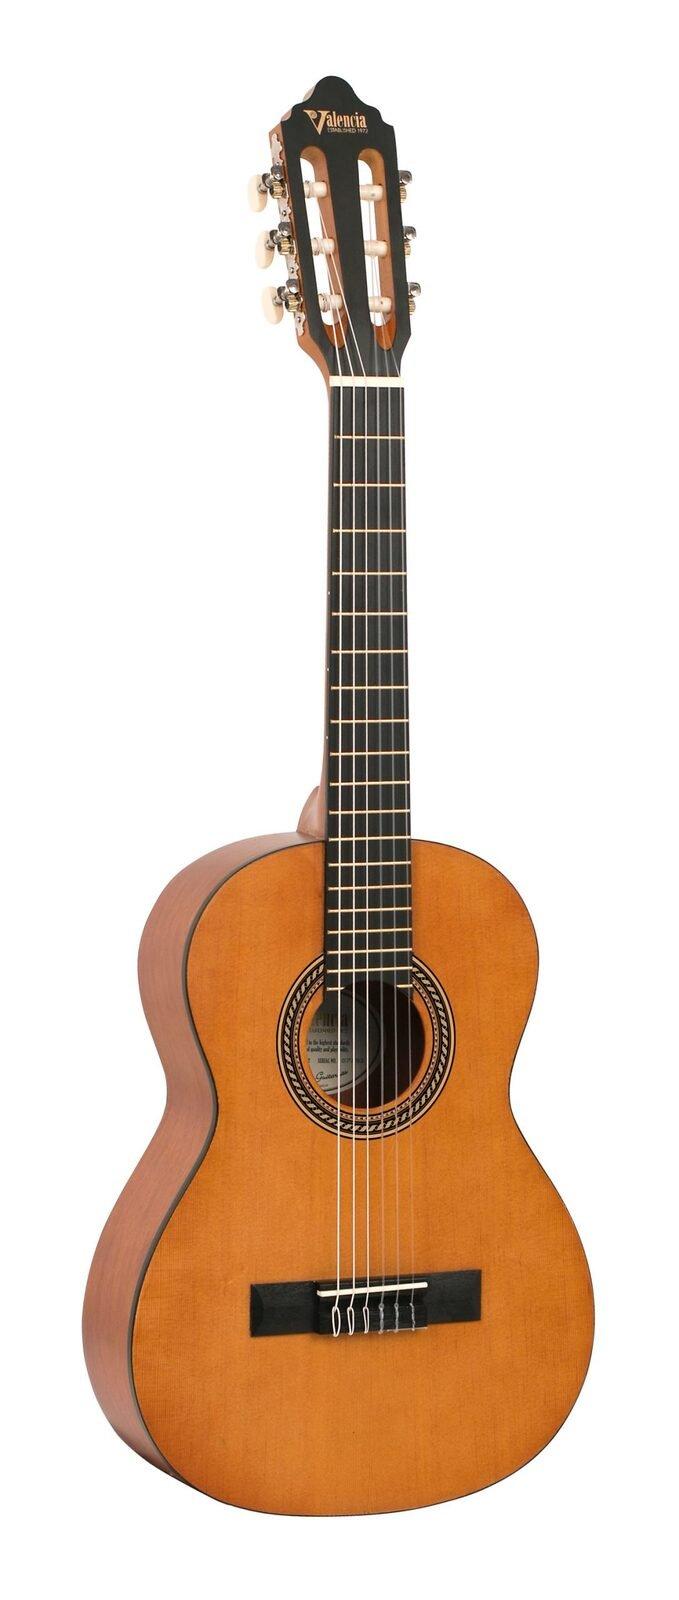 Valencia - VC202 - Classic Guitar